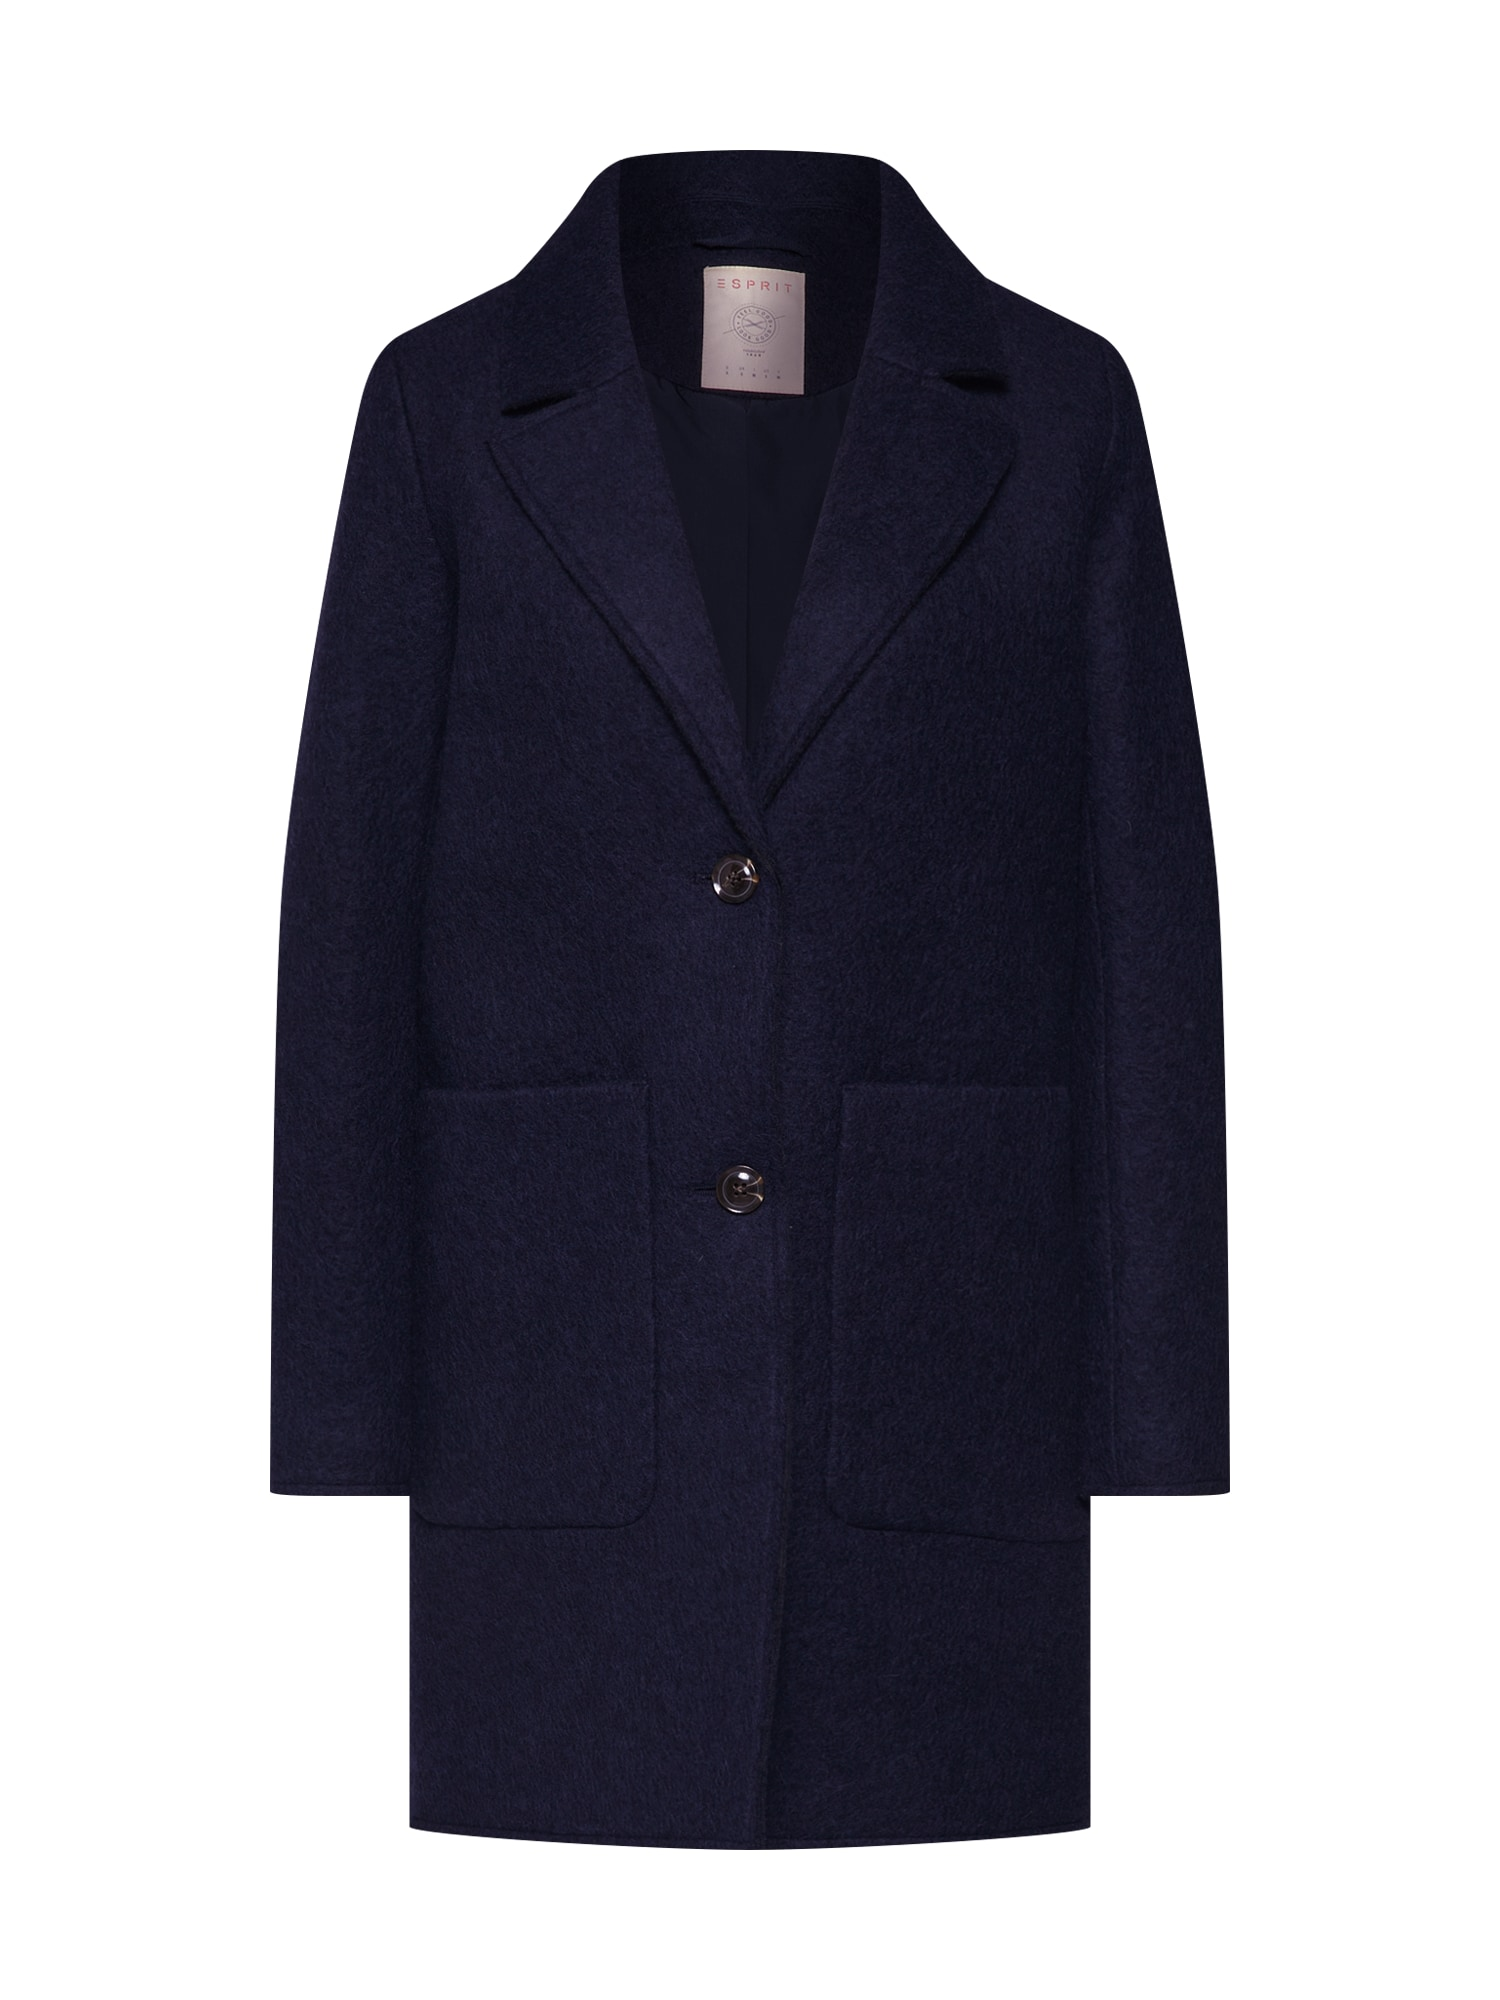 EDC BY ESPRIT Rudeninis-žieminis paltas 'Knitted Wool' tamsiai mėlyna